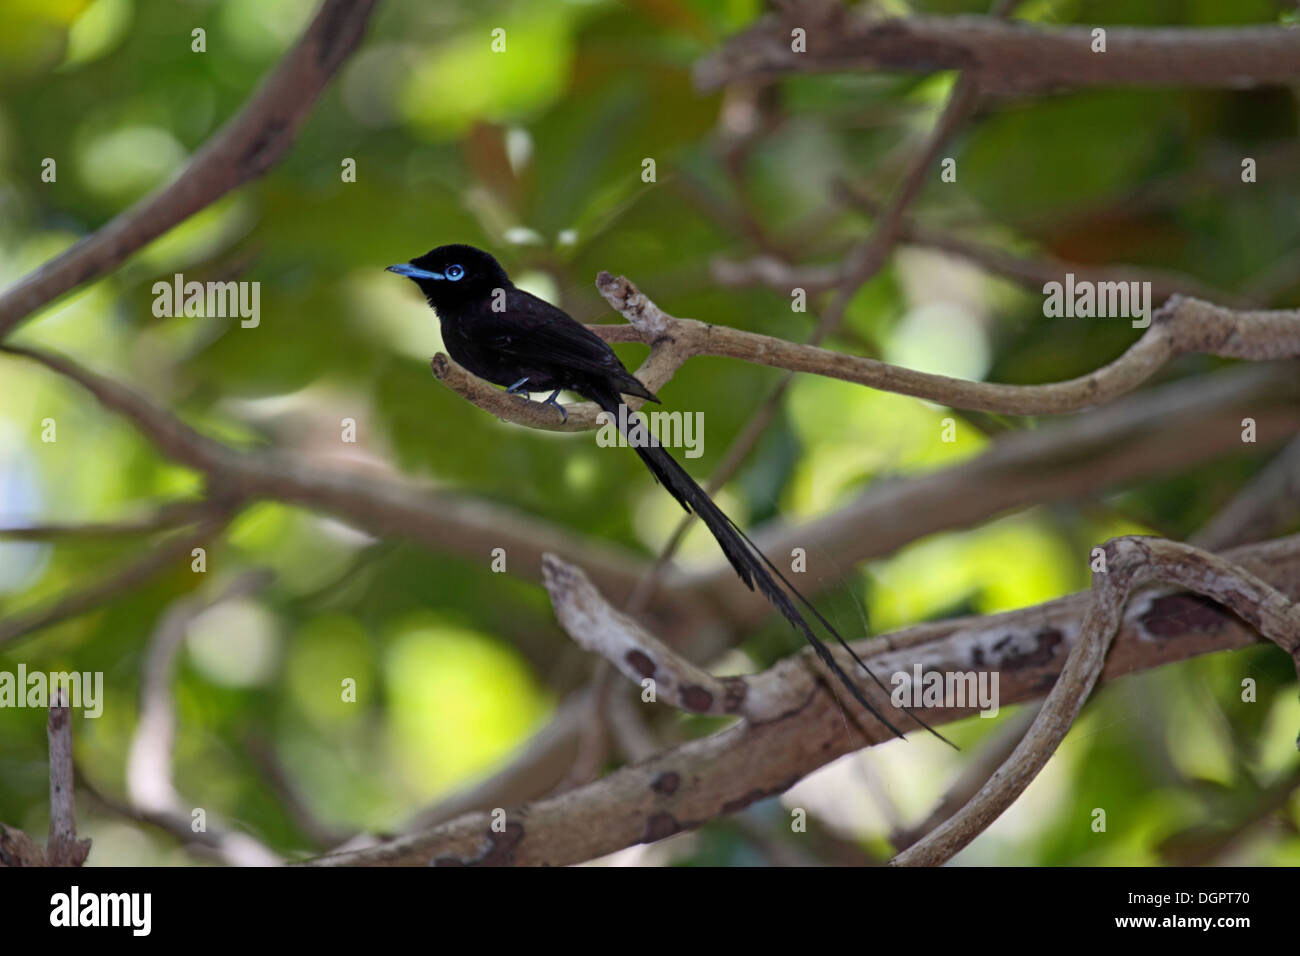 Seychelles black paradise flycatcher on an island in The Seychelles Stock Photo